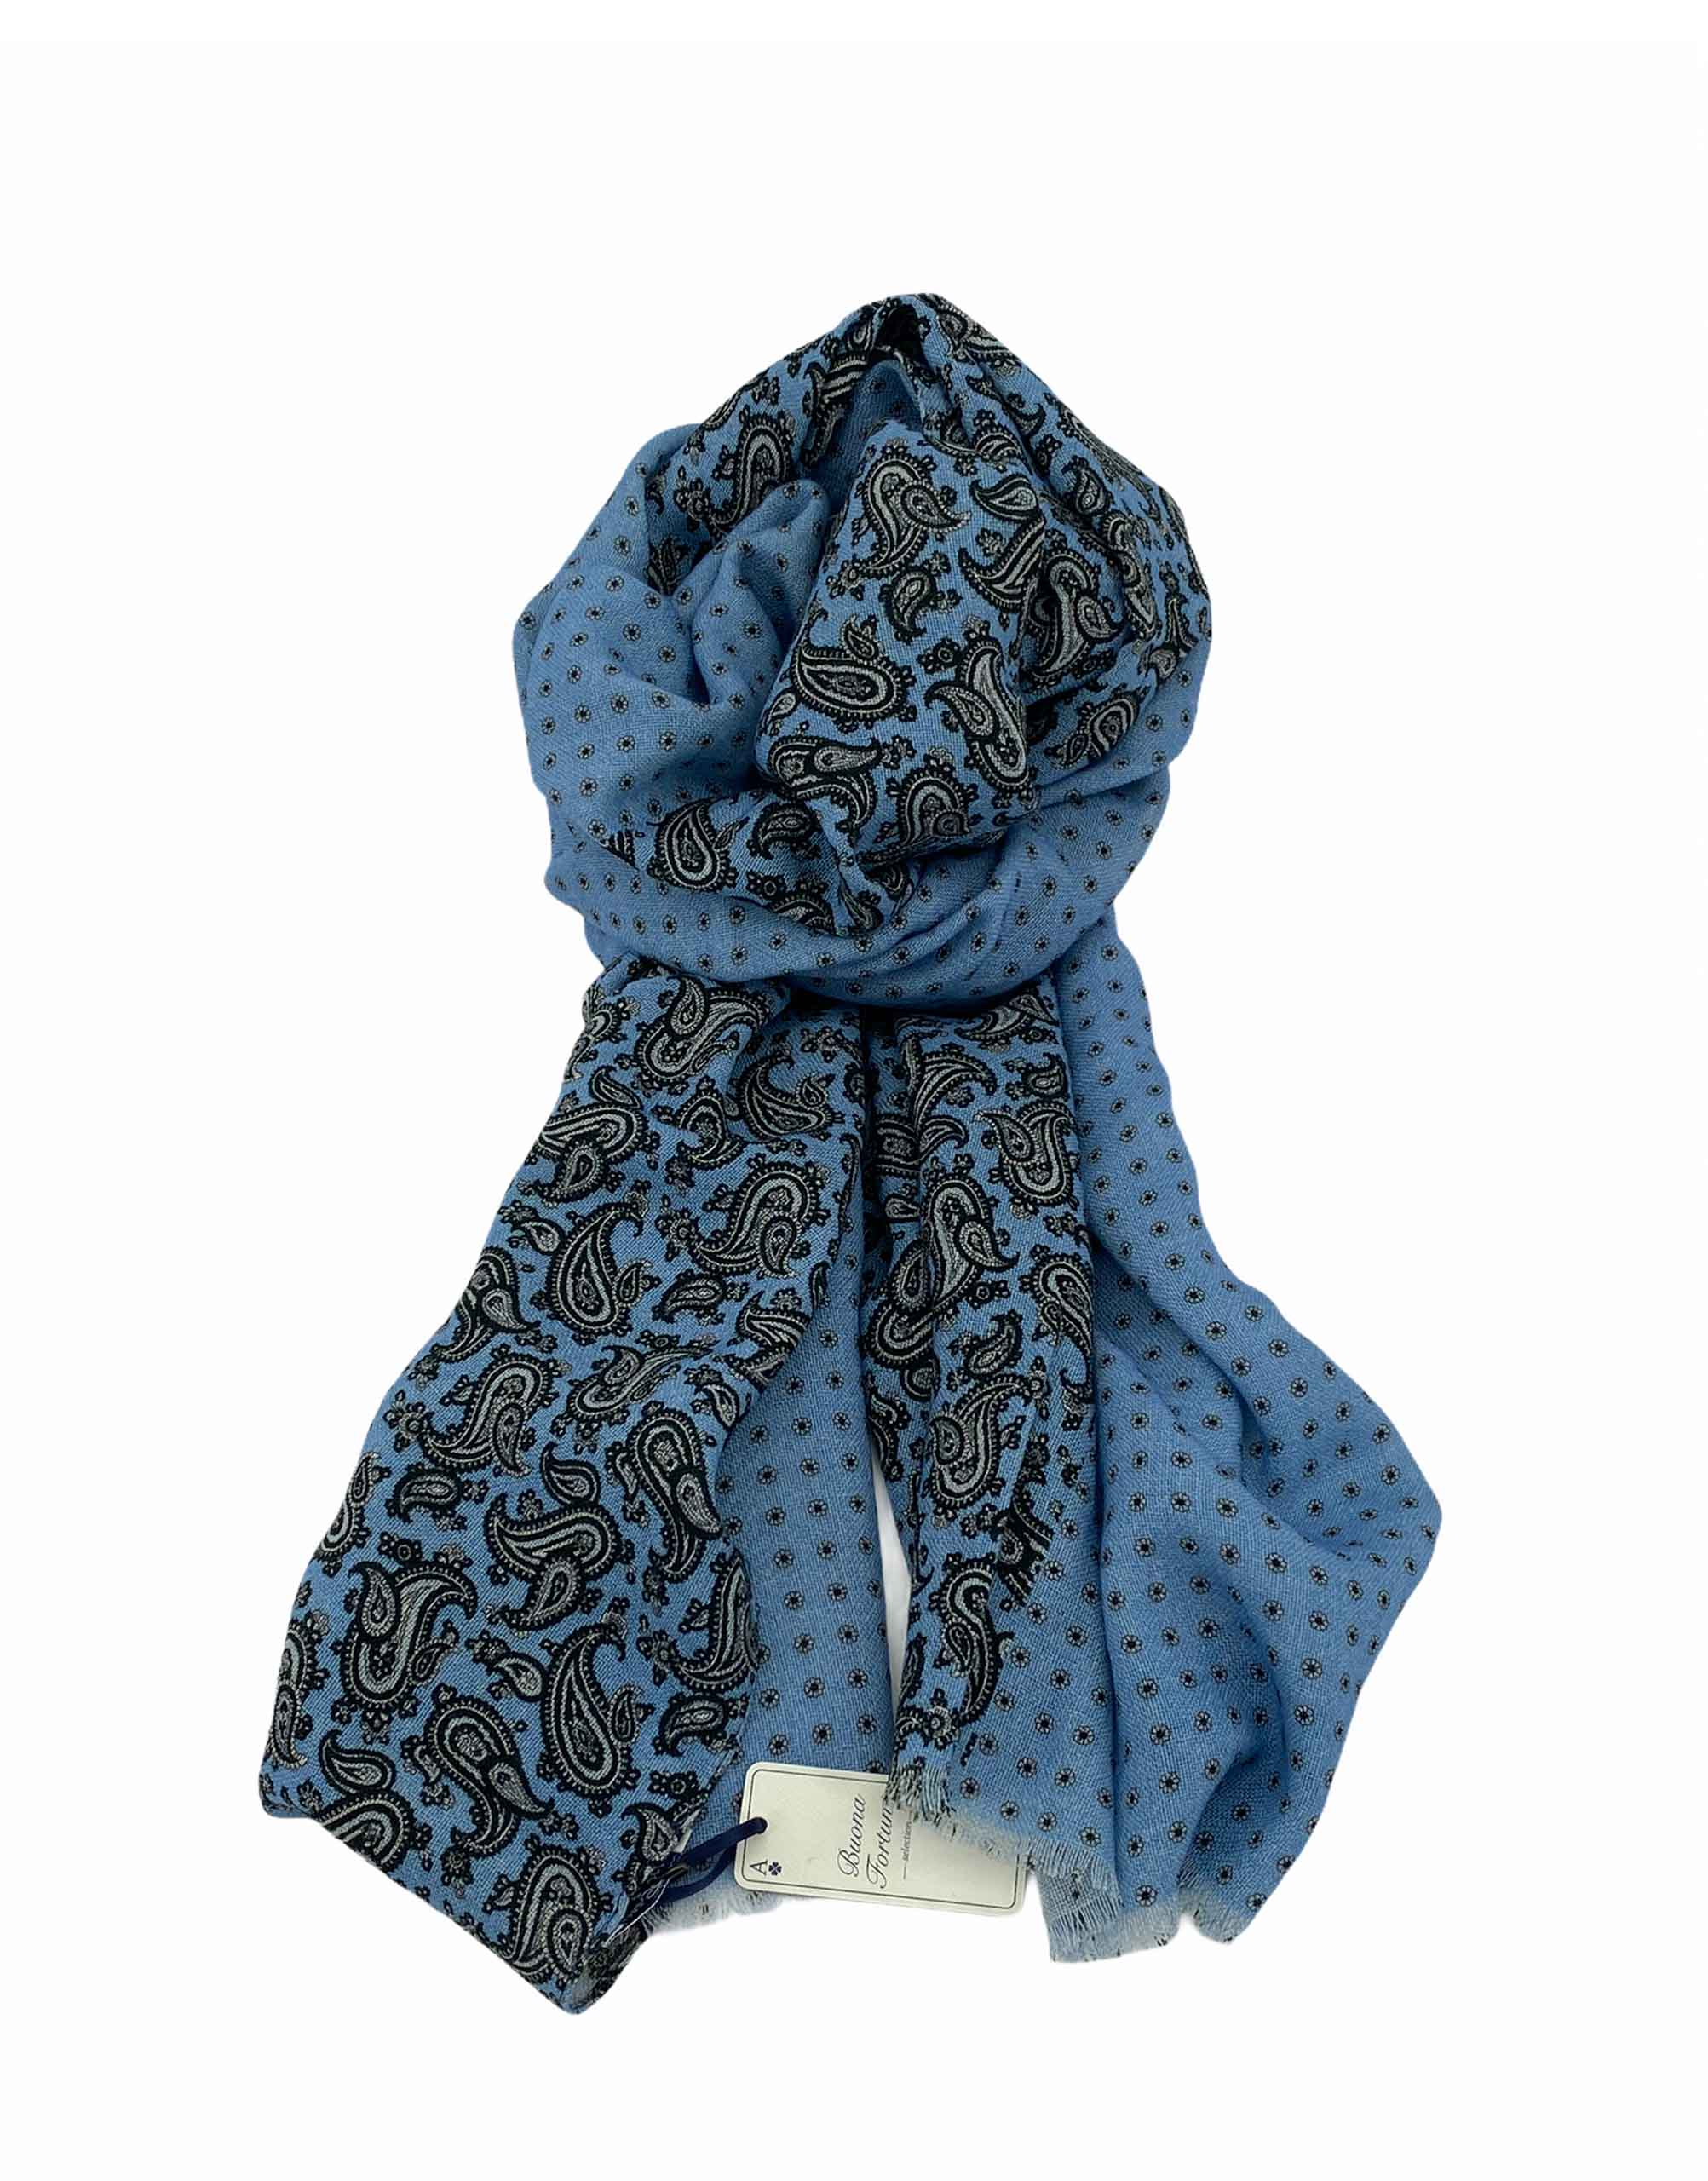 pashmina buona fortuna exclusivas comprar online moda italiana foulards shop topos marinos gris